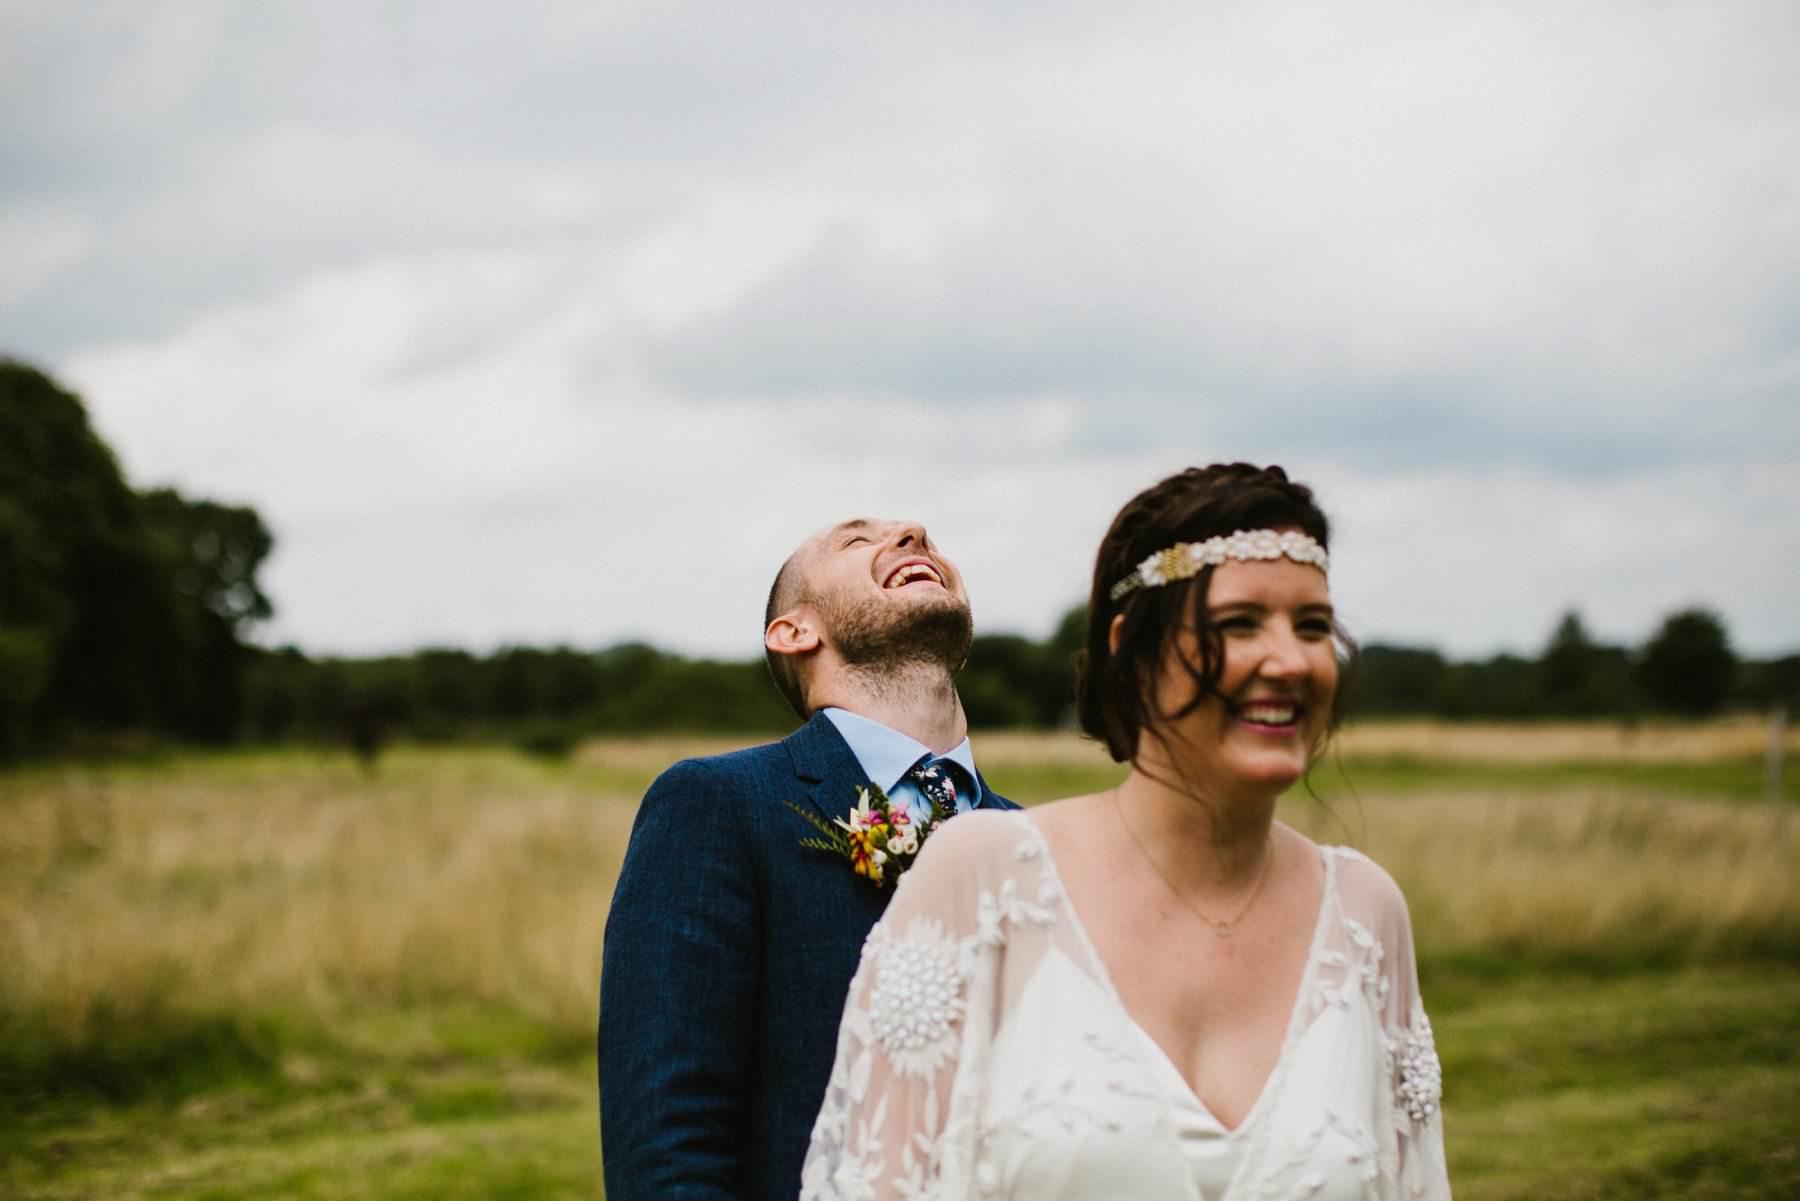 alternative wedding photography norfolk